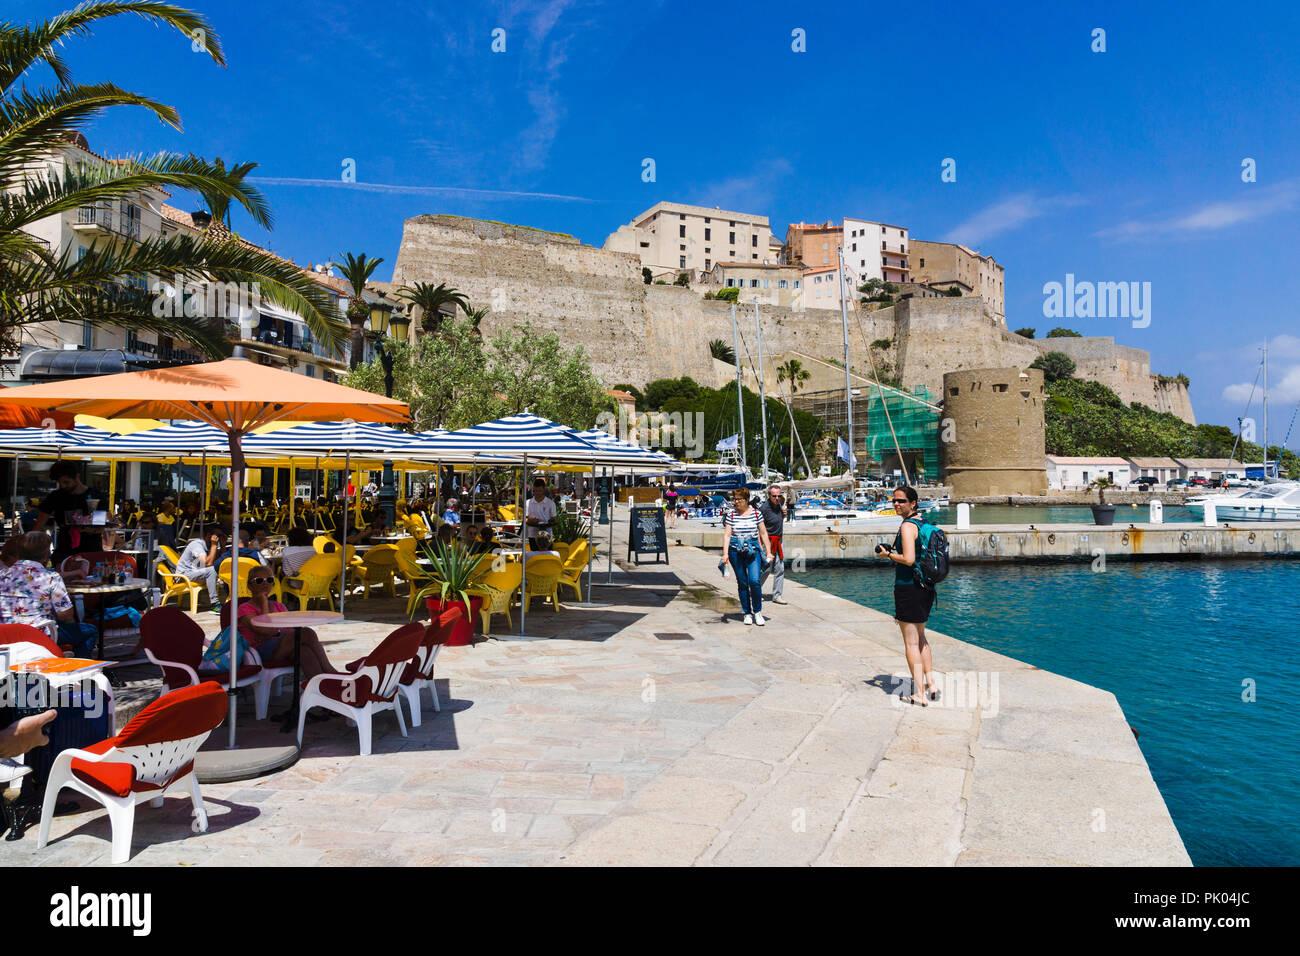 Waterfront restaurants, citadel in background. Calvi, Corsica, France - Stock Image